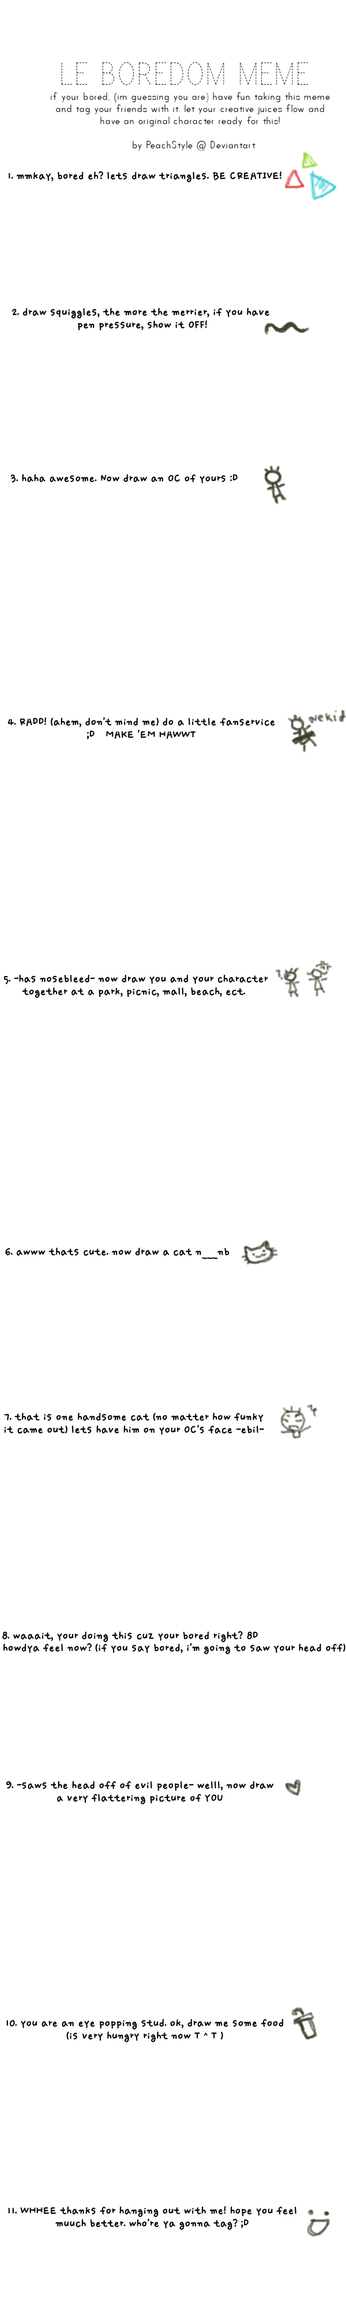 Boredom Meme by PeachStyle